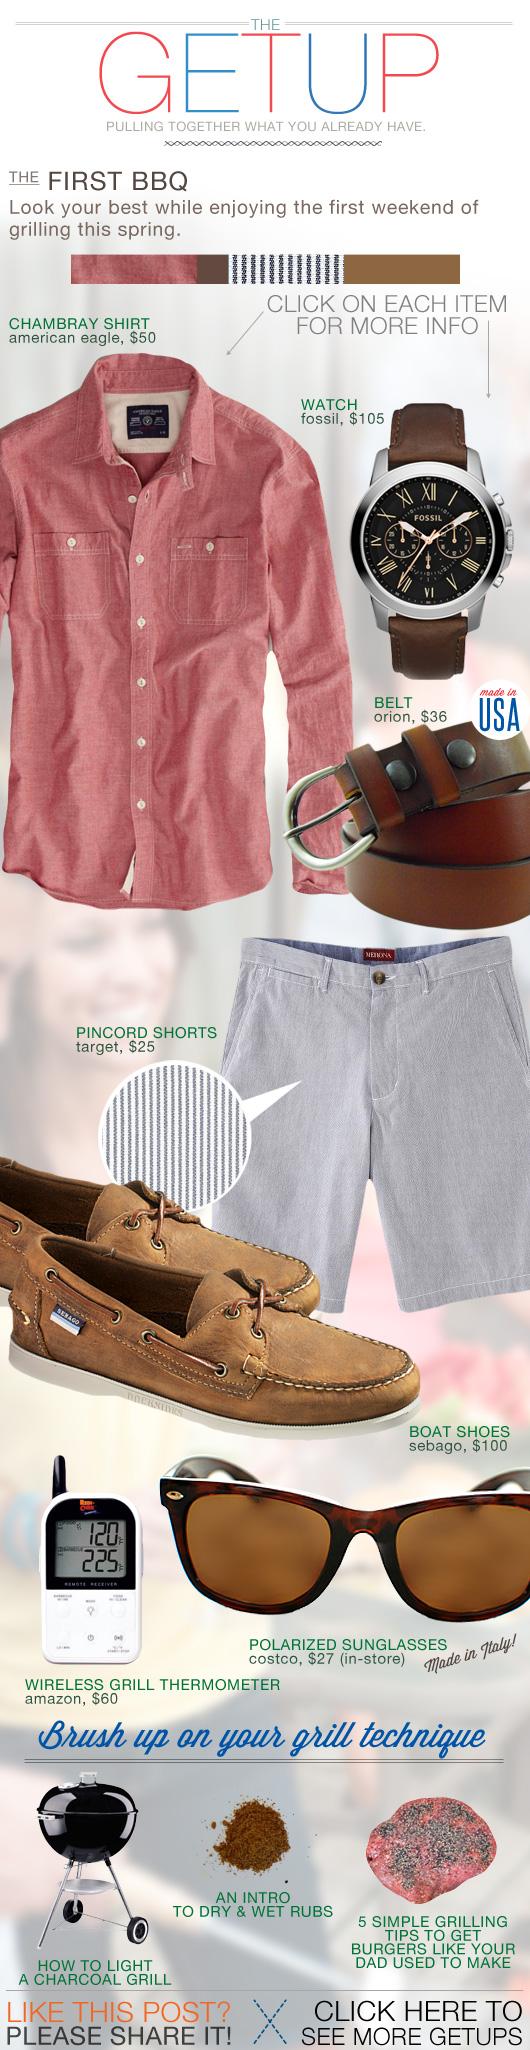 Getup First BBQ - pink chambray shirt, pincord shorts, brown boat shoes